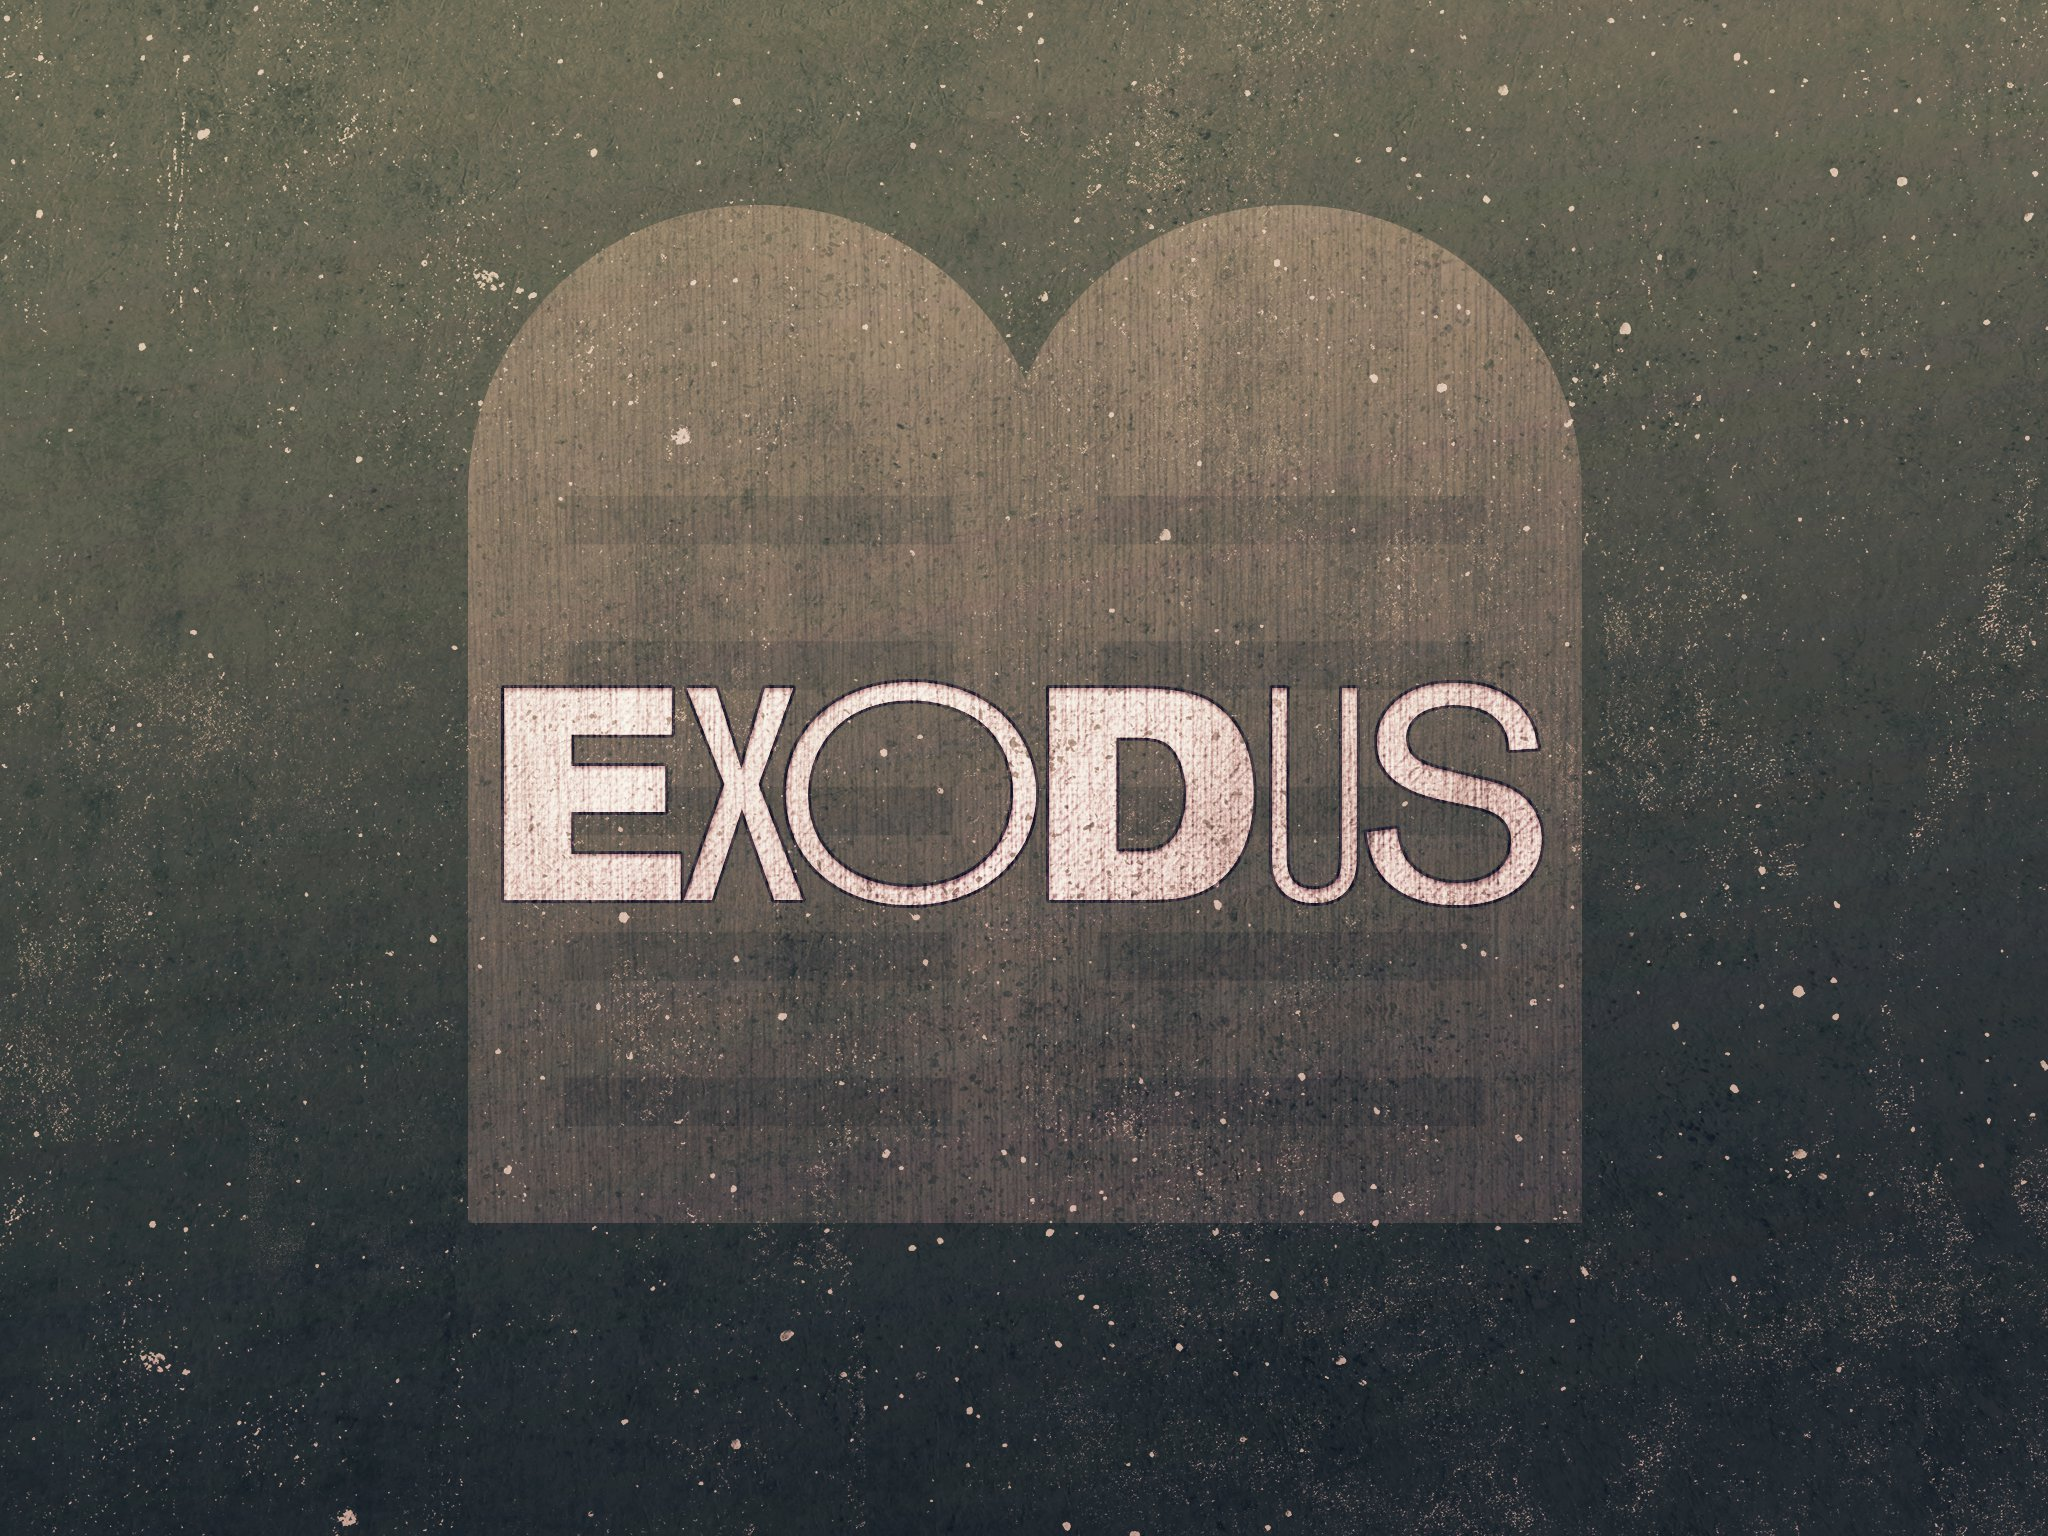 02-Exodus_Title_4x3-fullscreen.jpg